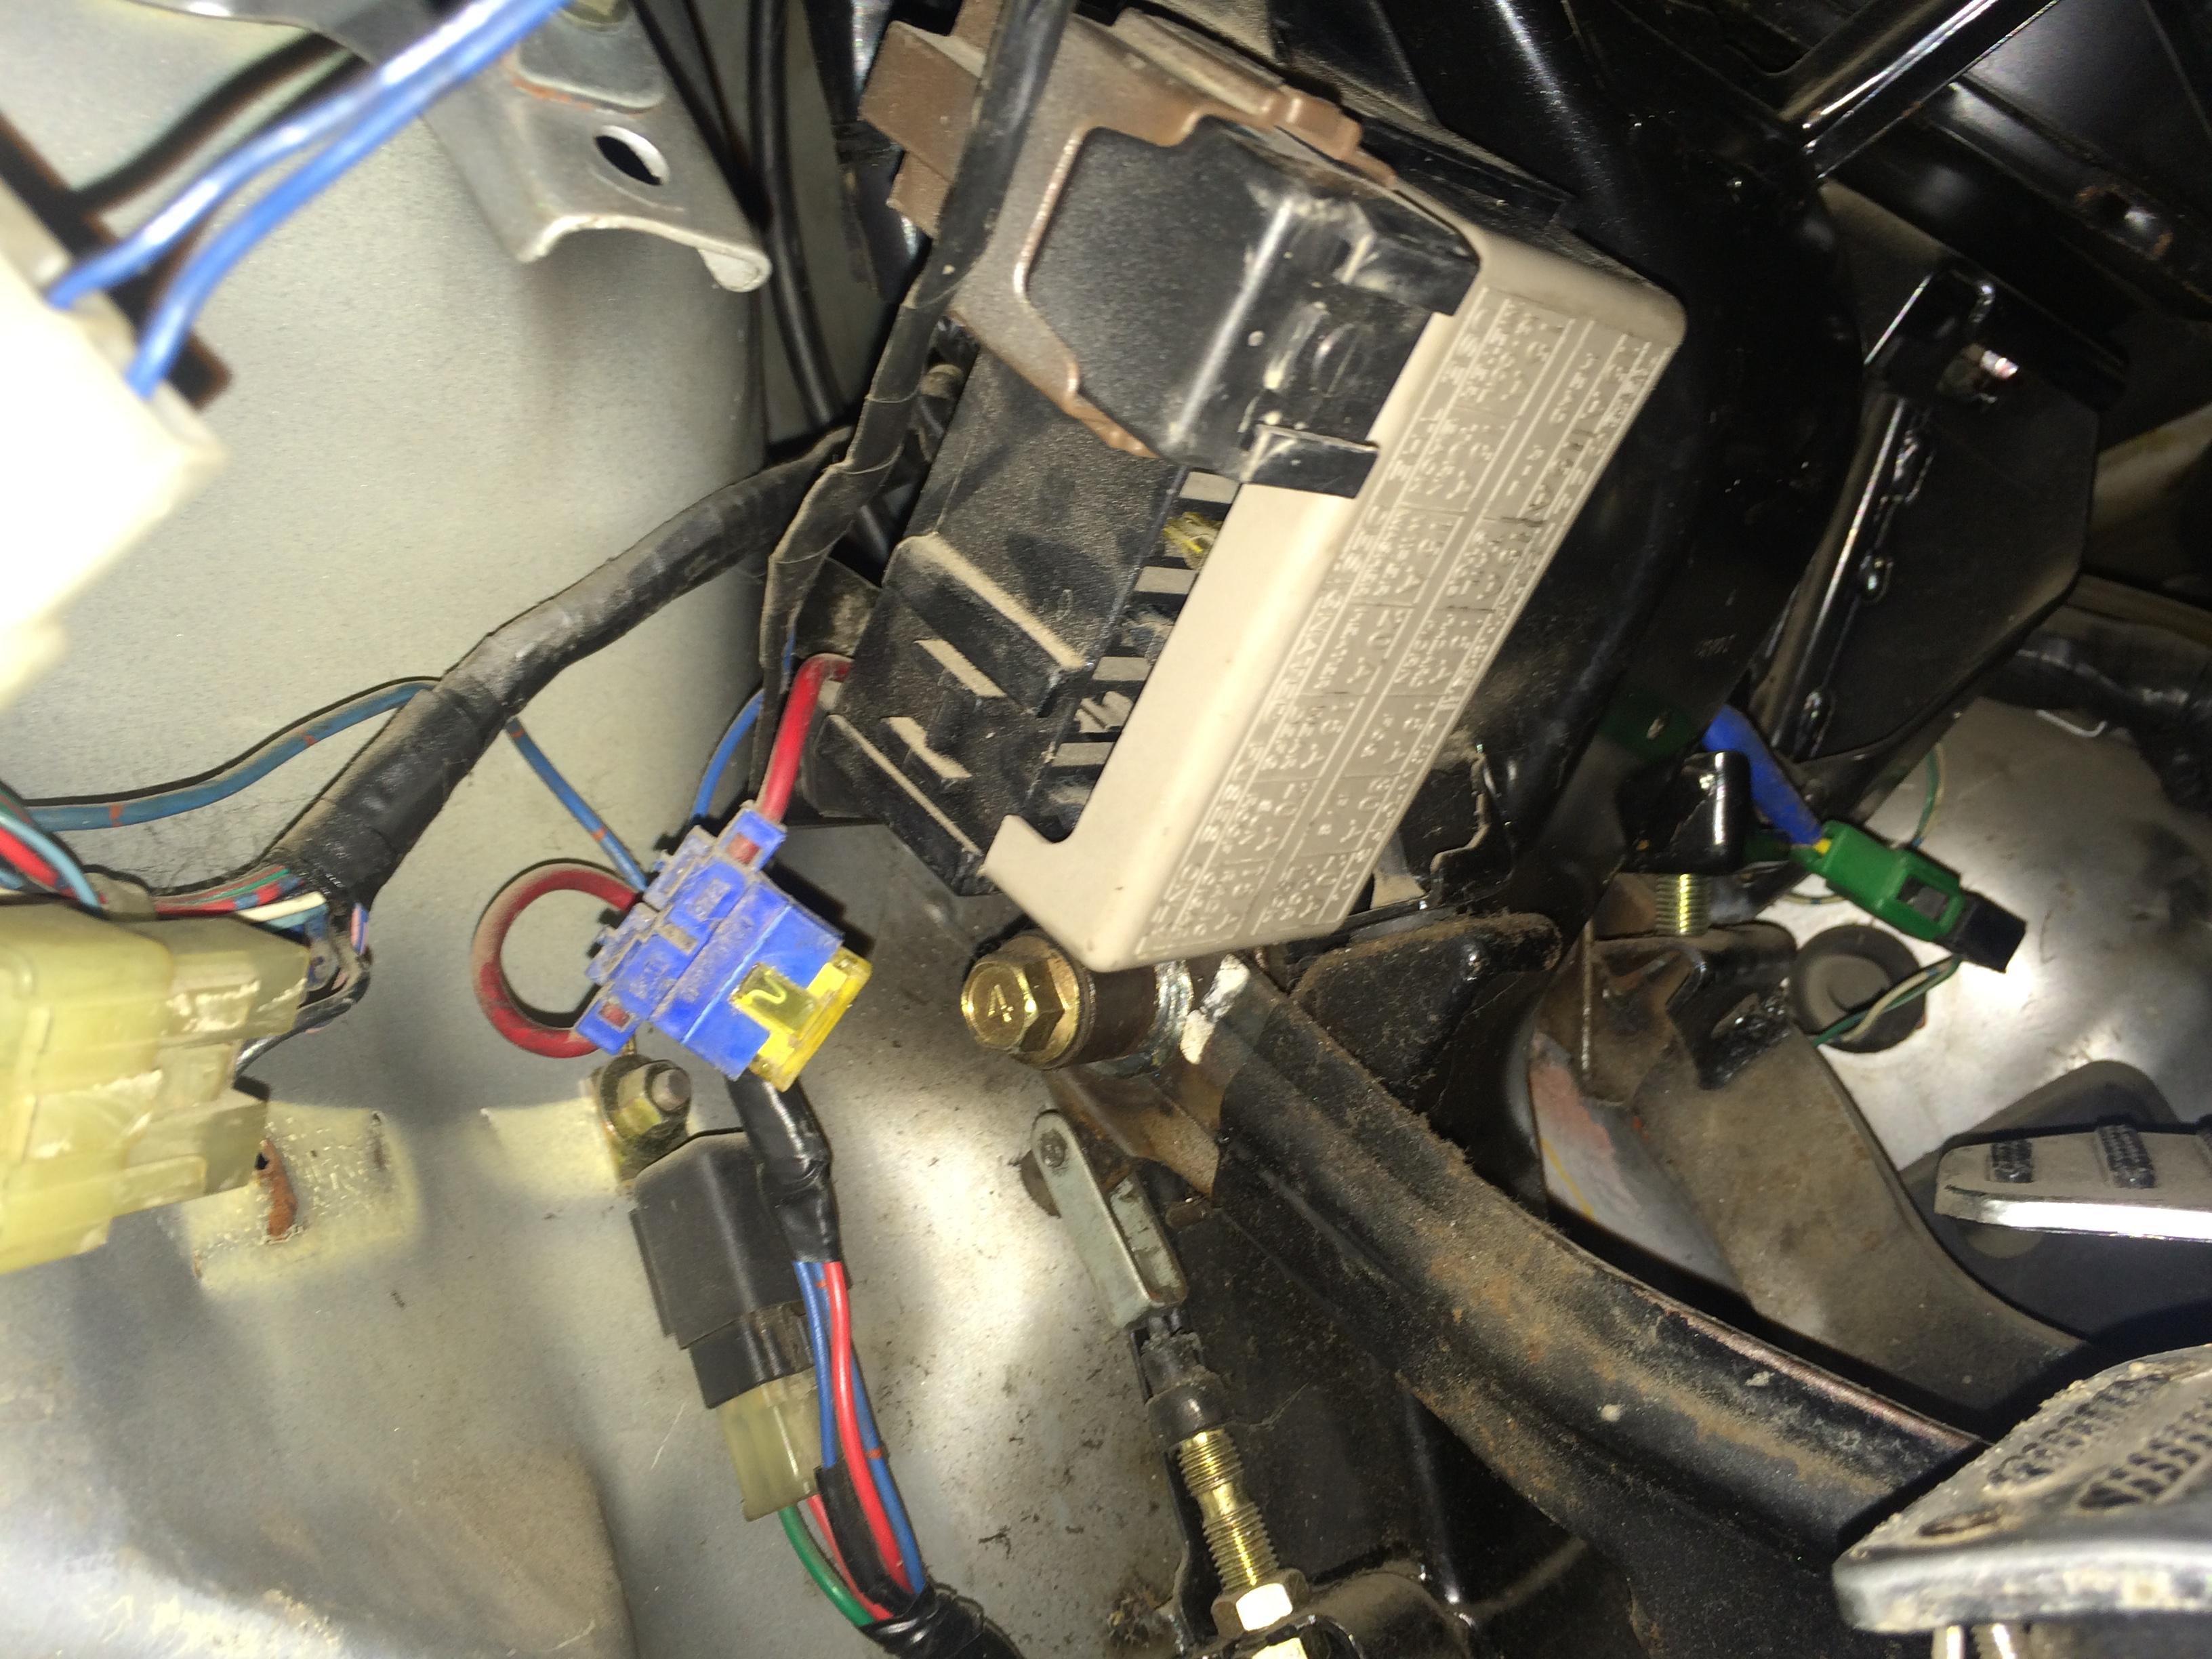 medium resolution of 1996 suzuki carry fuse box wiring diagram a7 1996 mazda 626 fuse box 1996 suzuki carry fuse box